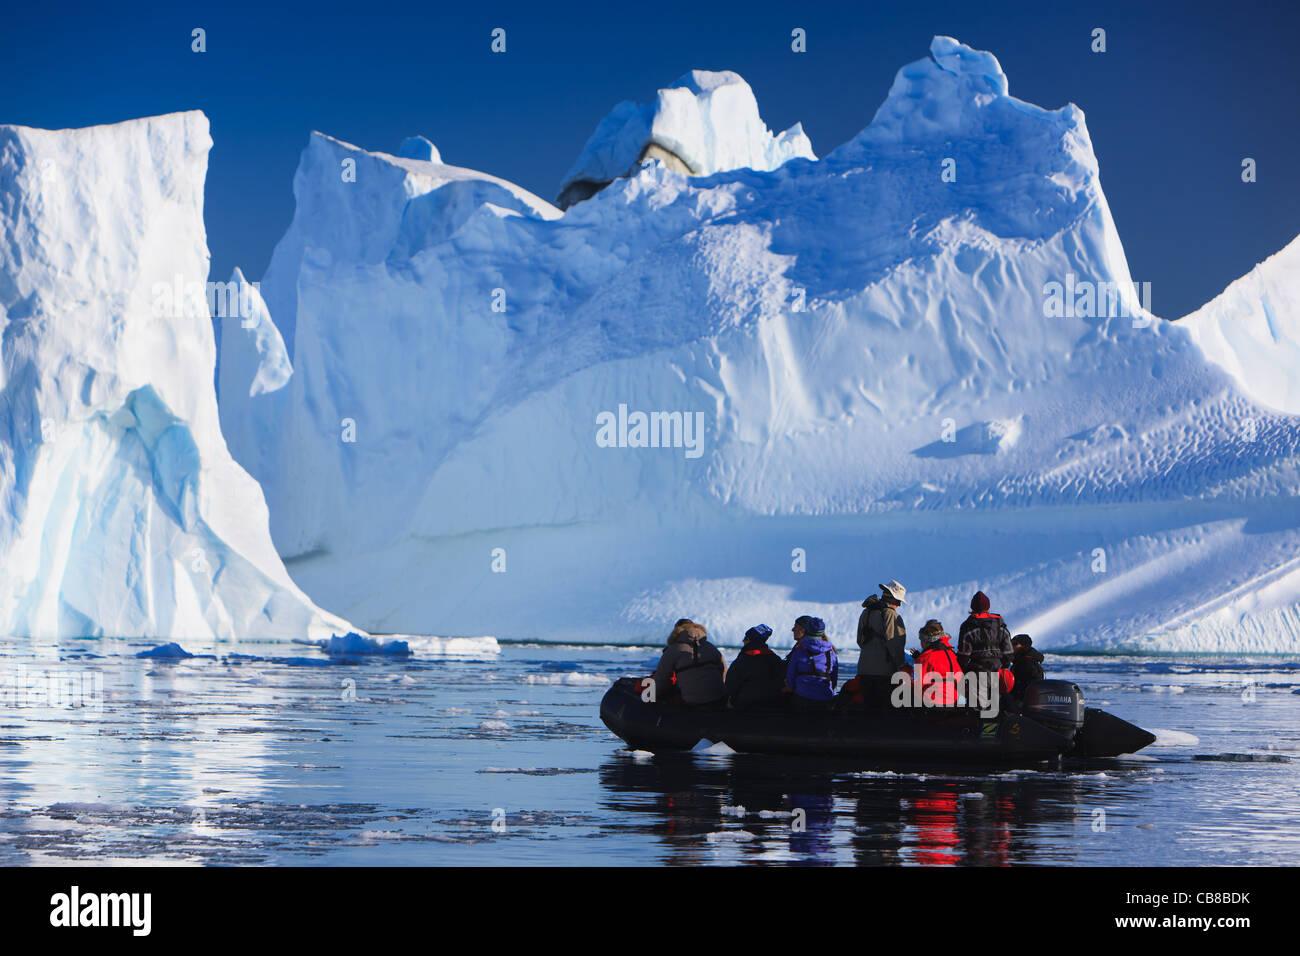 Zodiac cruising between the icebergs at Røde Ø, Scoresbysund, Greenland - Stock Image